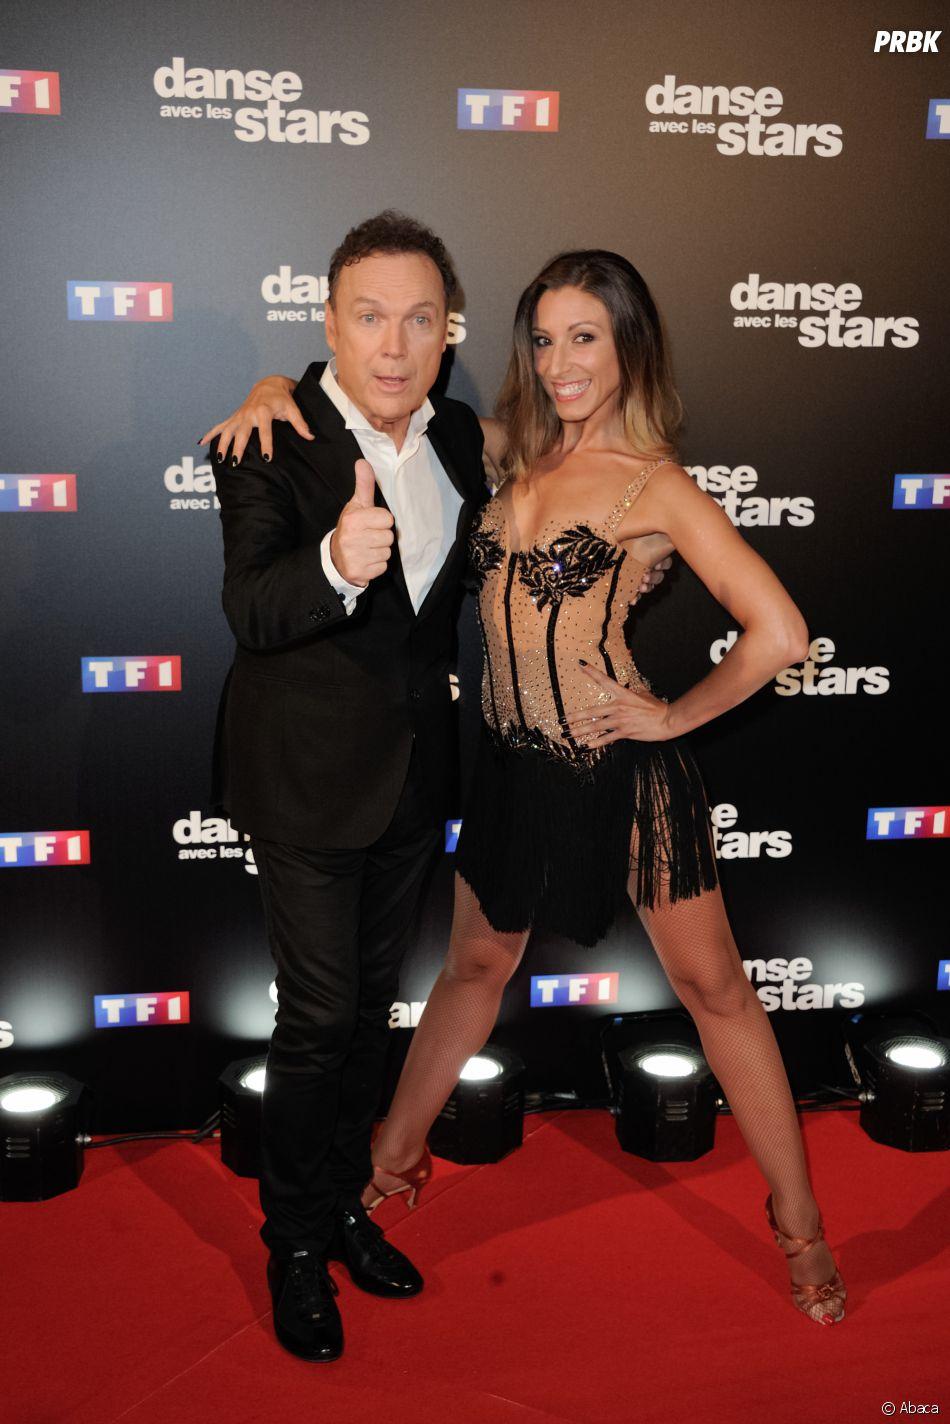 Julien Lepers dansera avec Silvia Notargiacomo dans Danse avec les stars 7